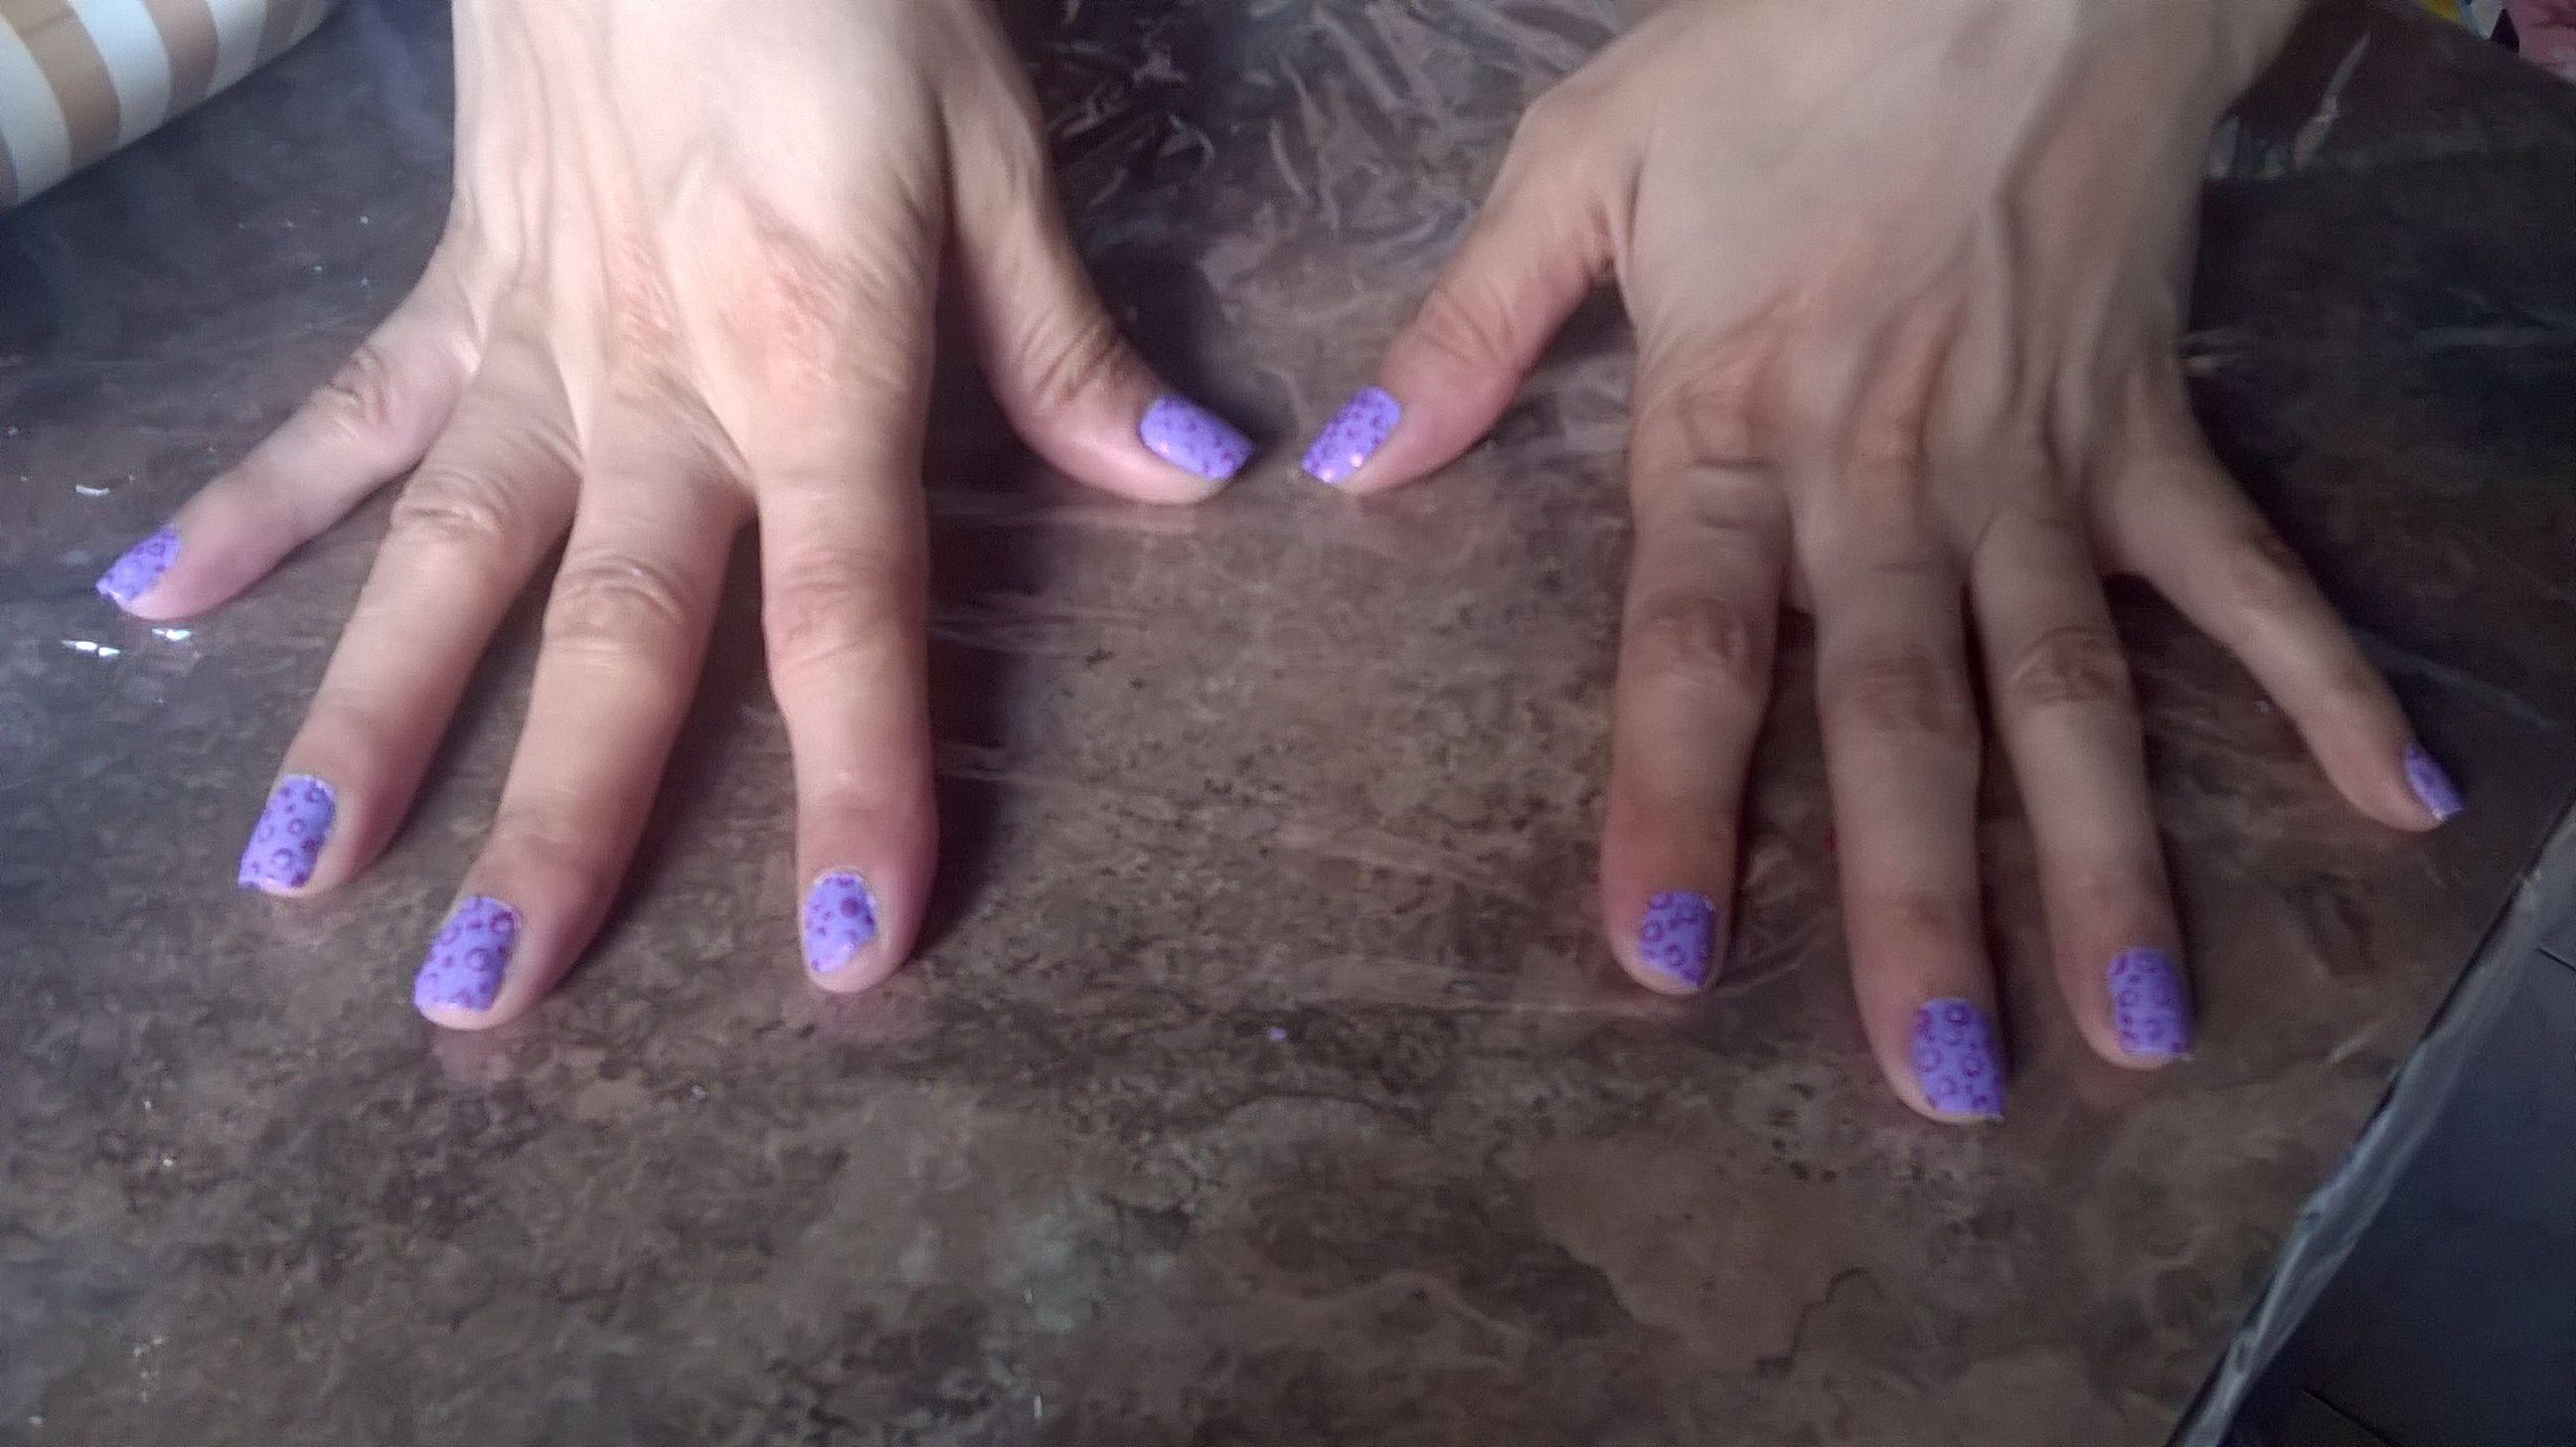 Puntos violeta